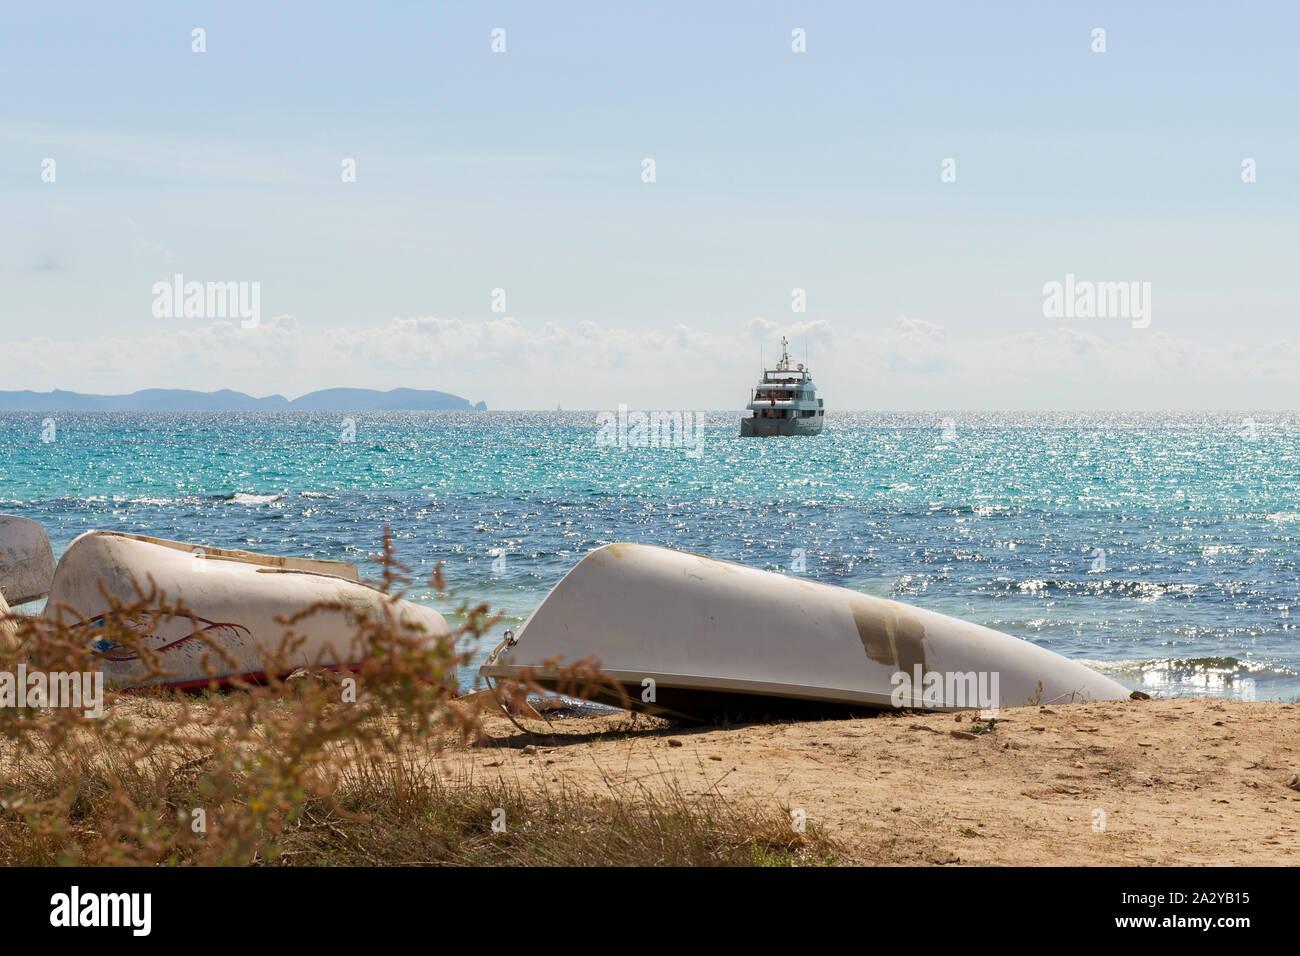 Postkartenmotiv, Mallorca, Yacht, blaues Meer, Urlaub auf Mallorca, Cala Ratjada, Yacht auf Meer, Sandstrand, Ruderboot am Strand, Fischerboote, Fisch Stock Photo